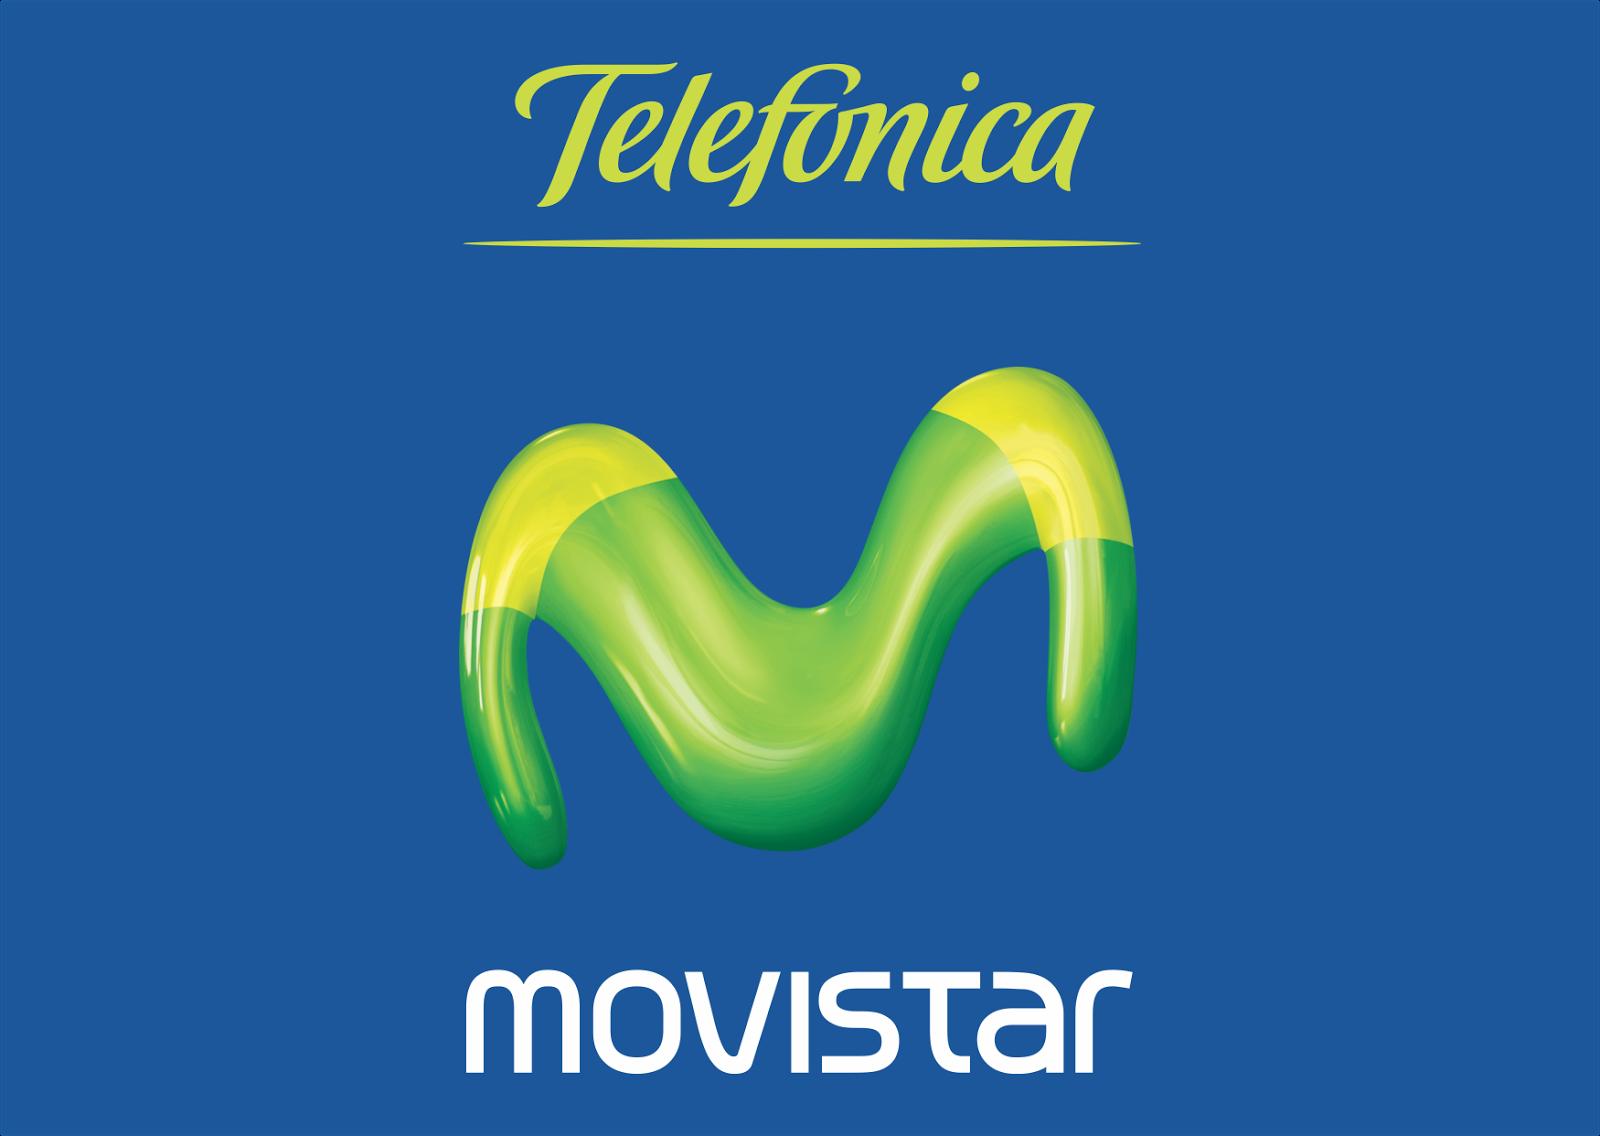 movistar logo vector mobile phone operator company